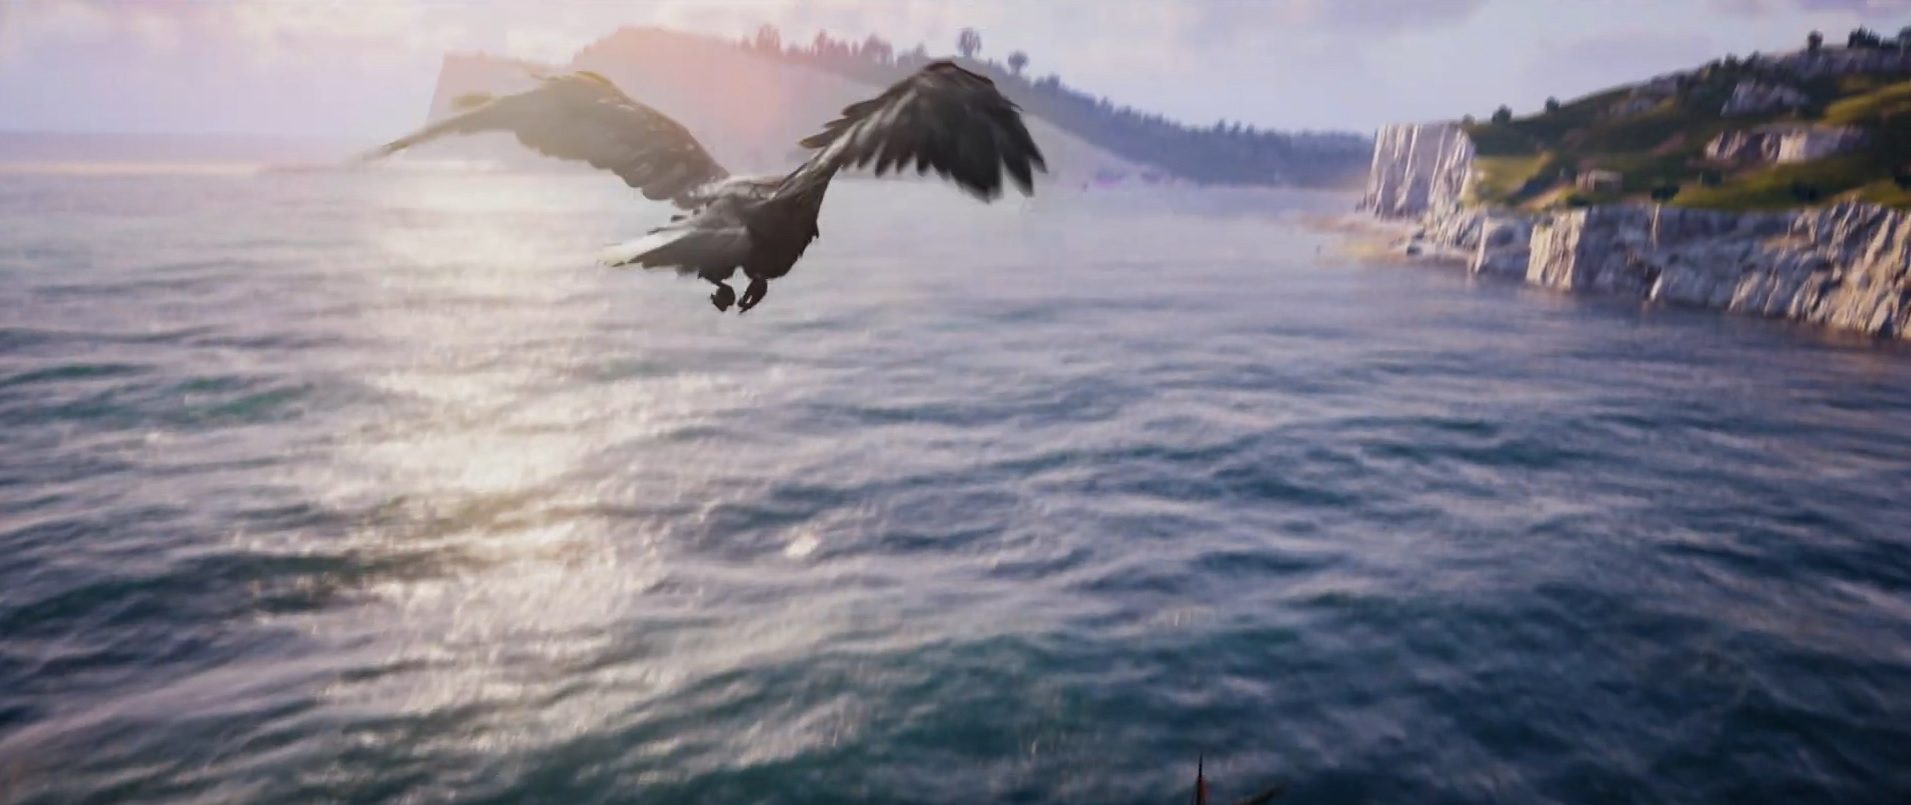 Assassin's Creed Valhalla Dover